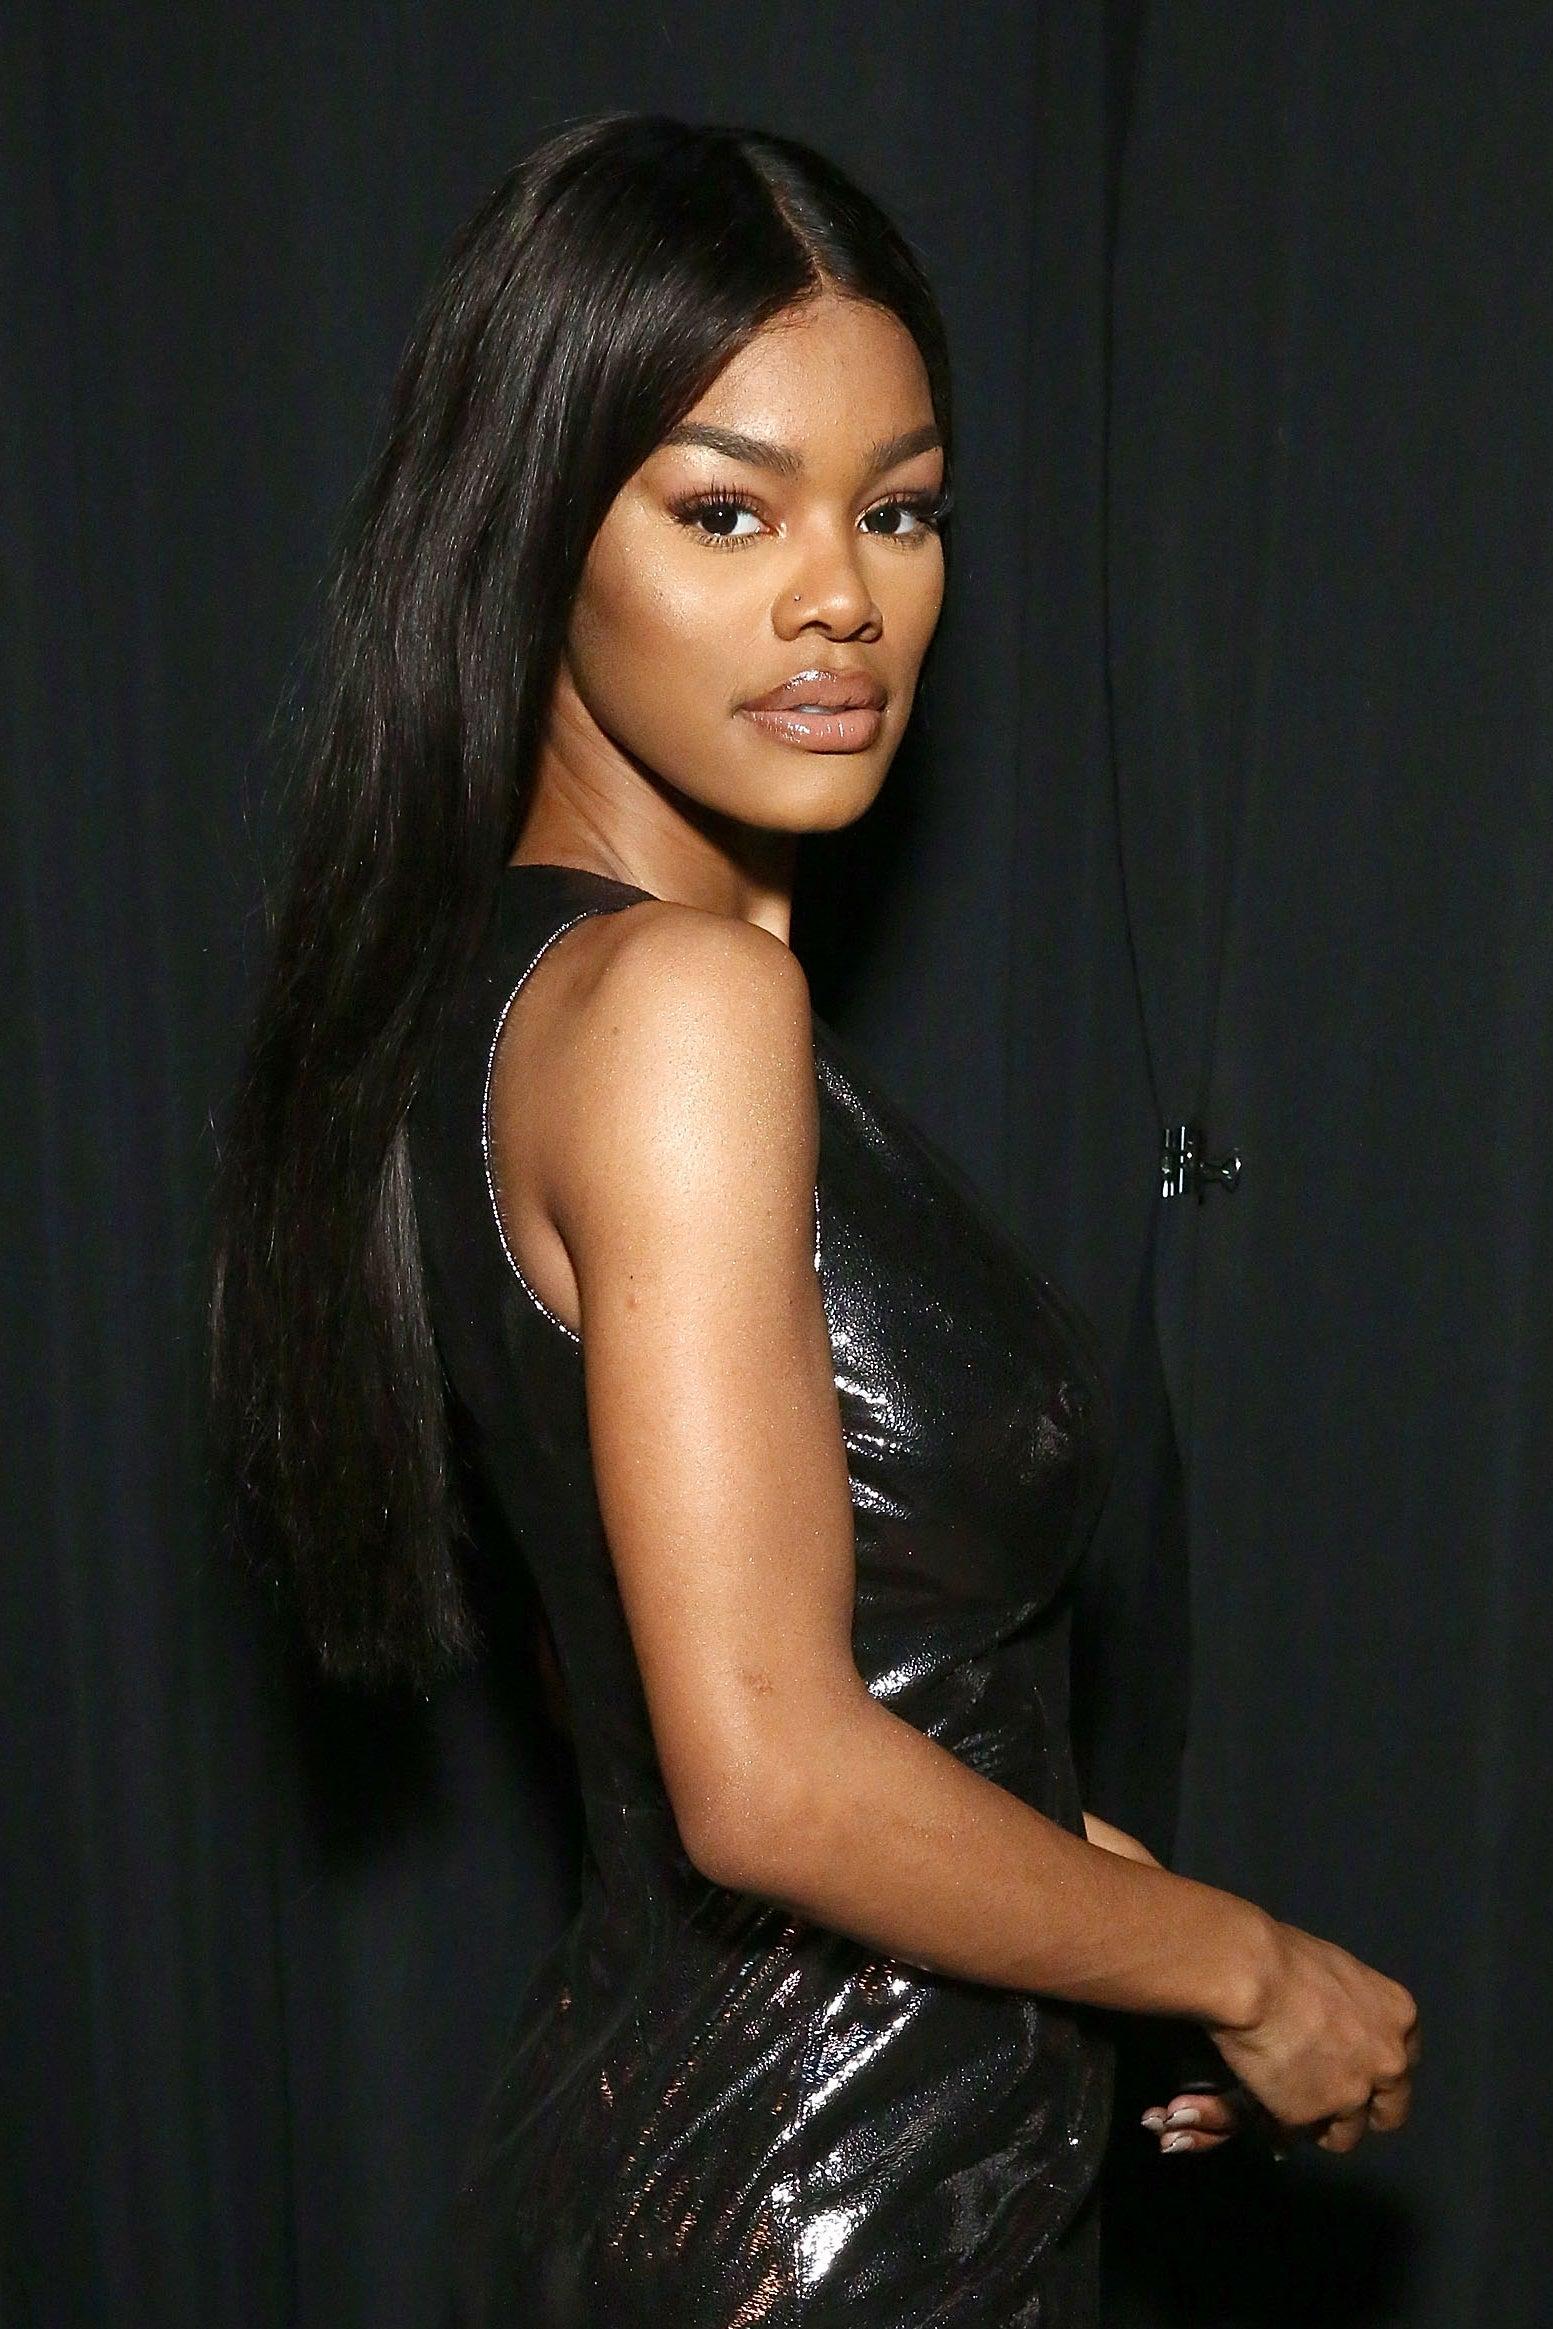 Teyana Taylor Hairstyles 2016 - Essence